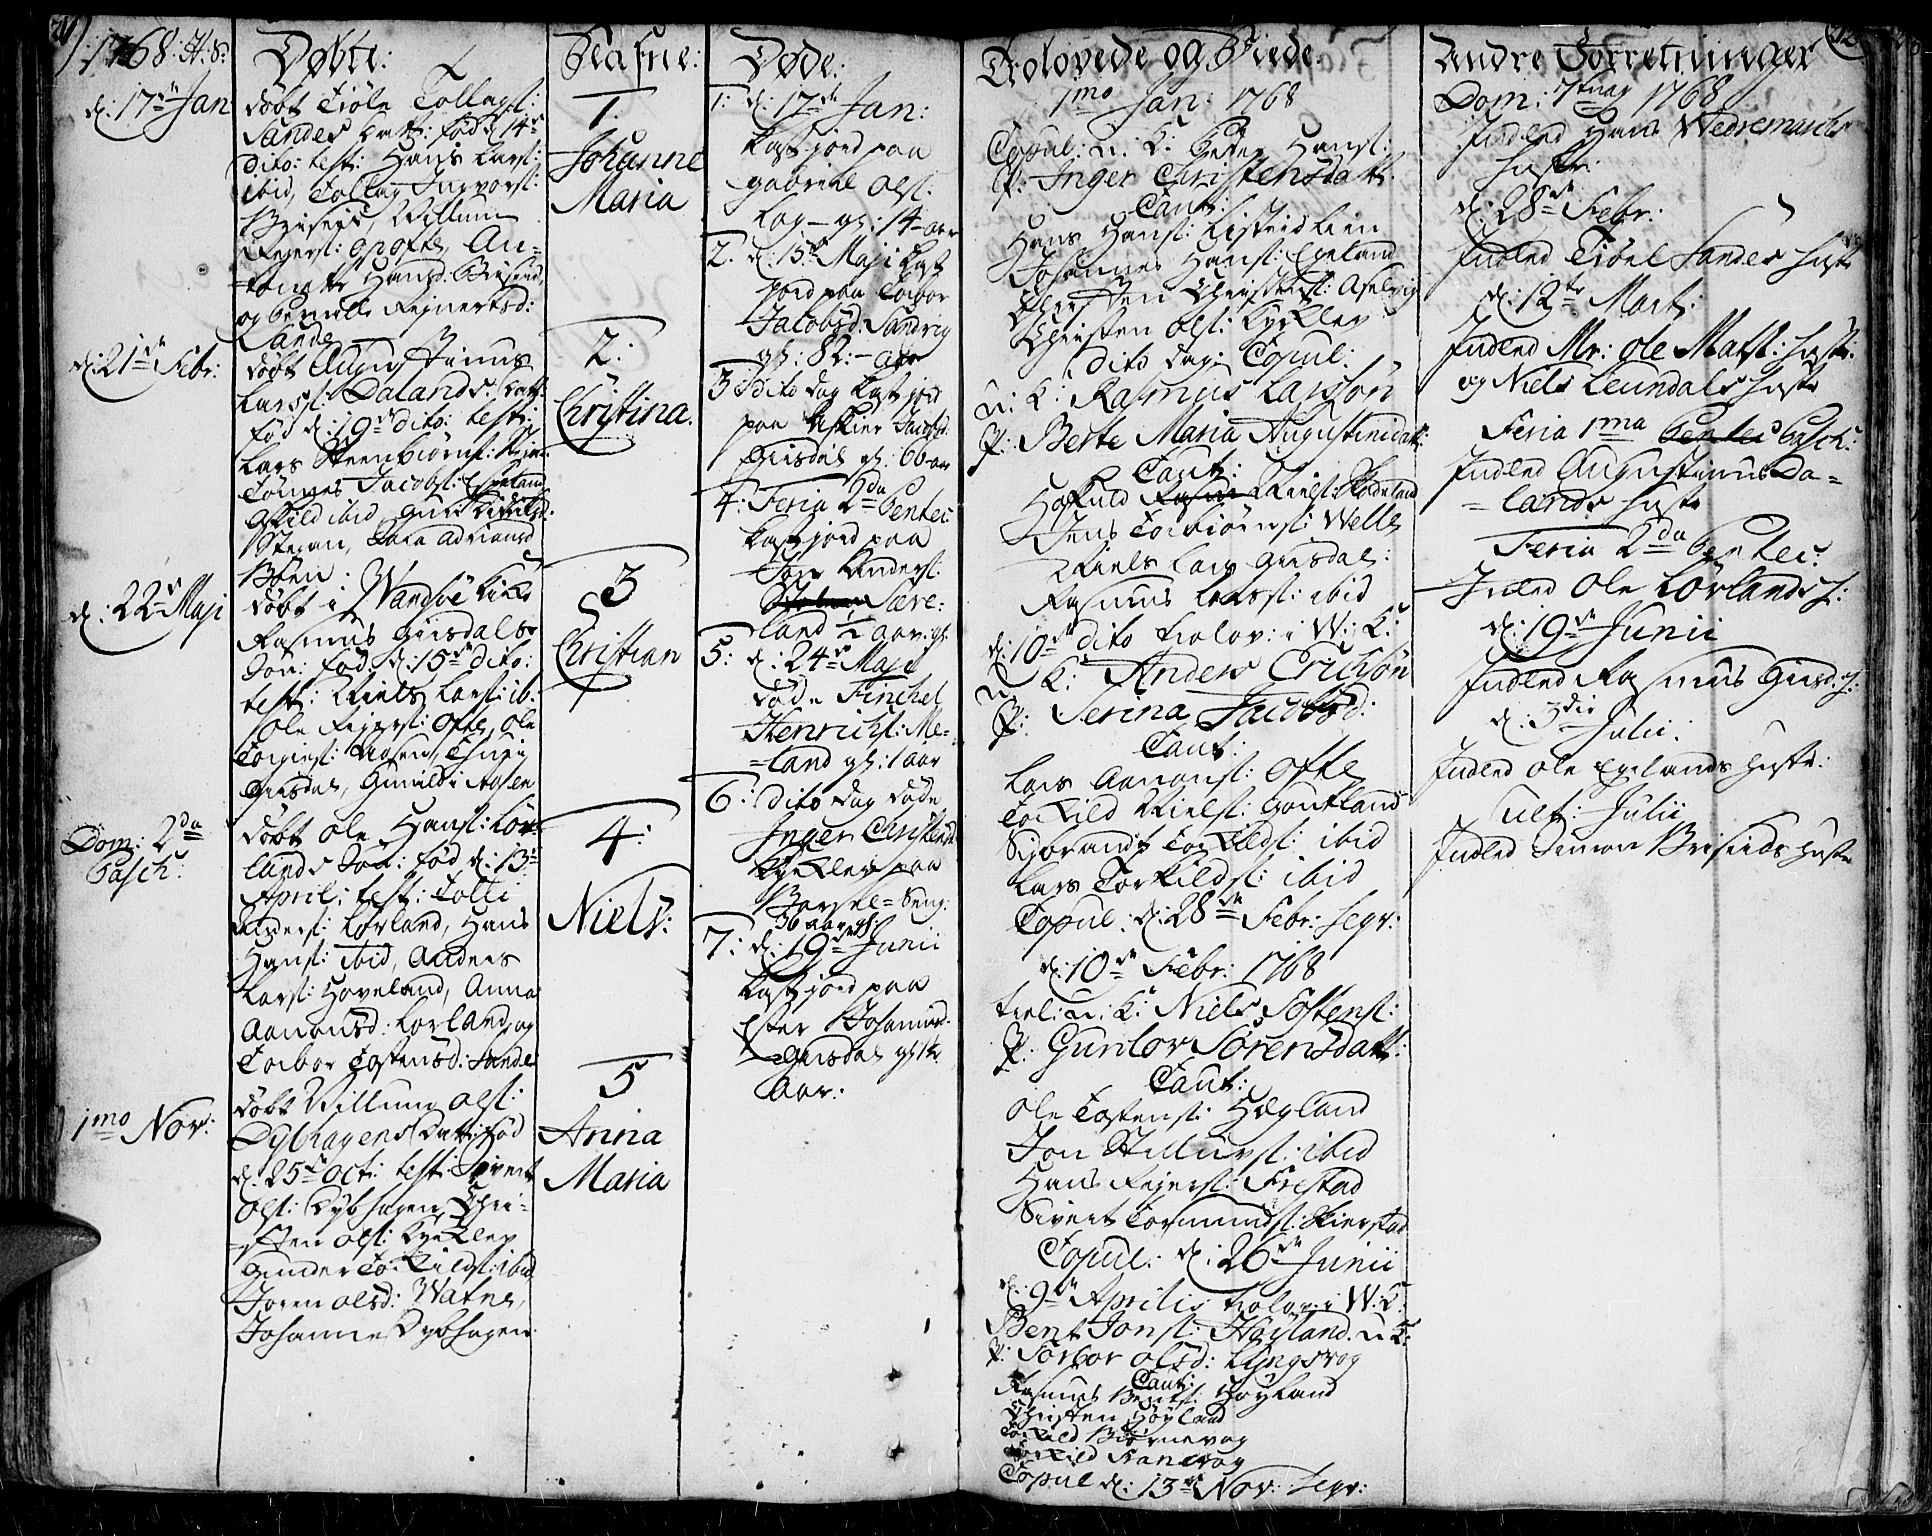 SAK, Herad sokneprestkontor, F/Fa/Faa/L0001: Ministerialbok nr. A 1 /1, 1768-1799, s. 211-212